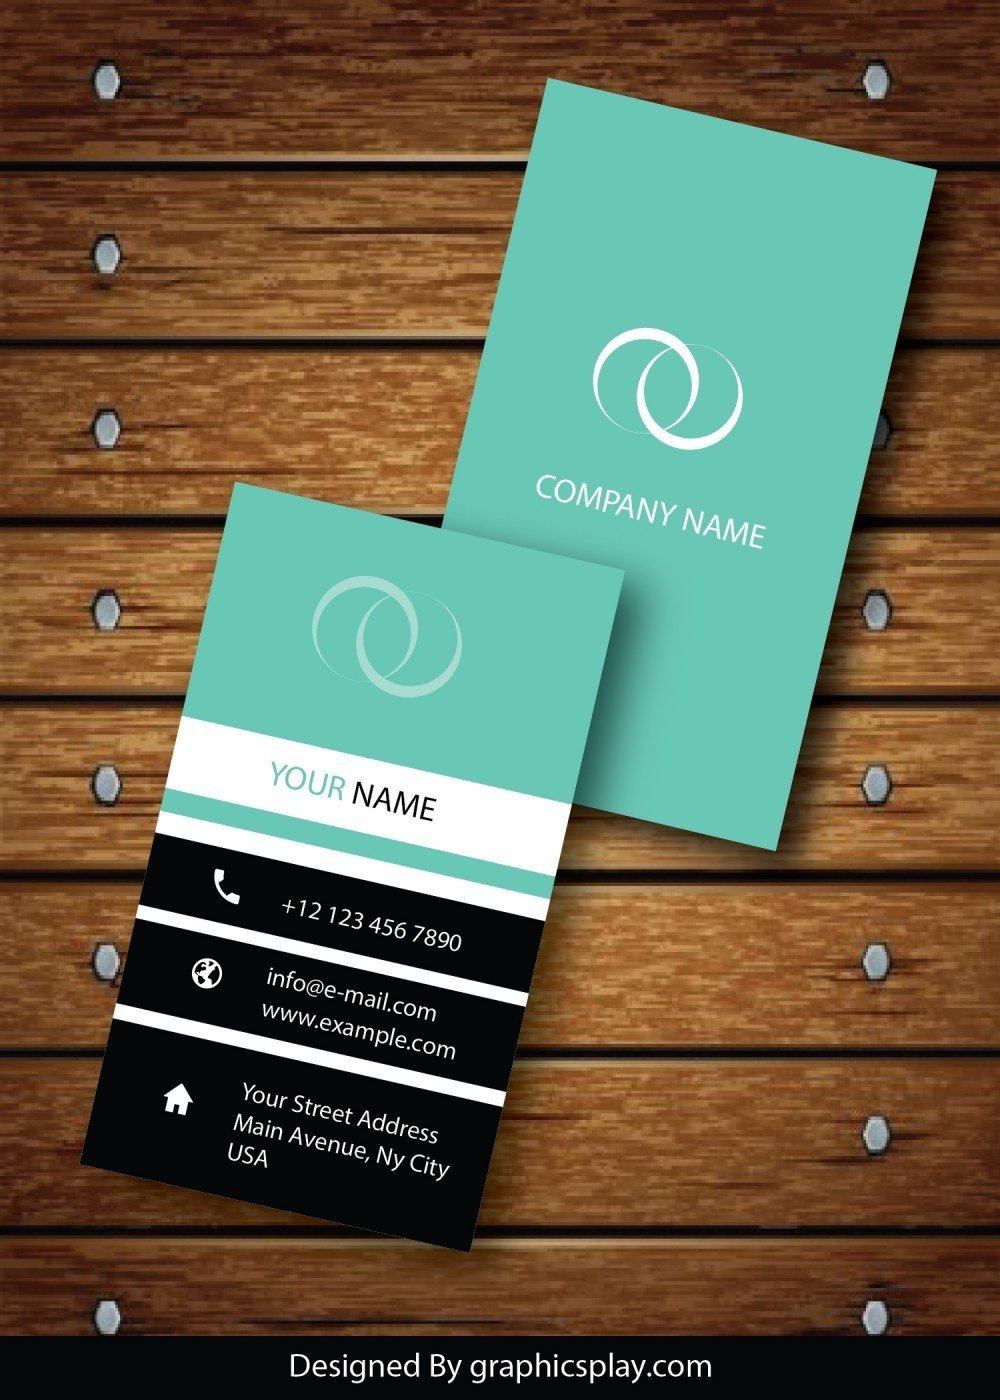 Vertical Business Card Design Vector Template - ID 1736 ...